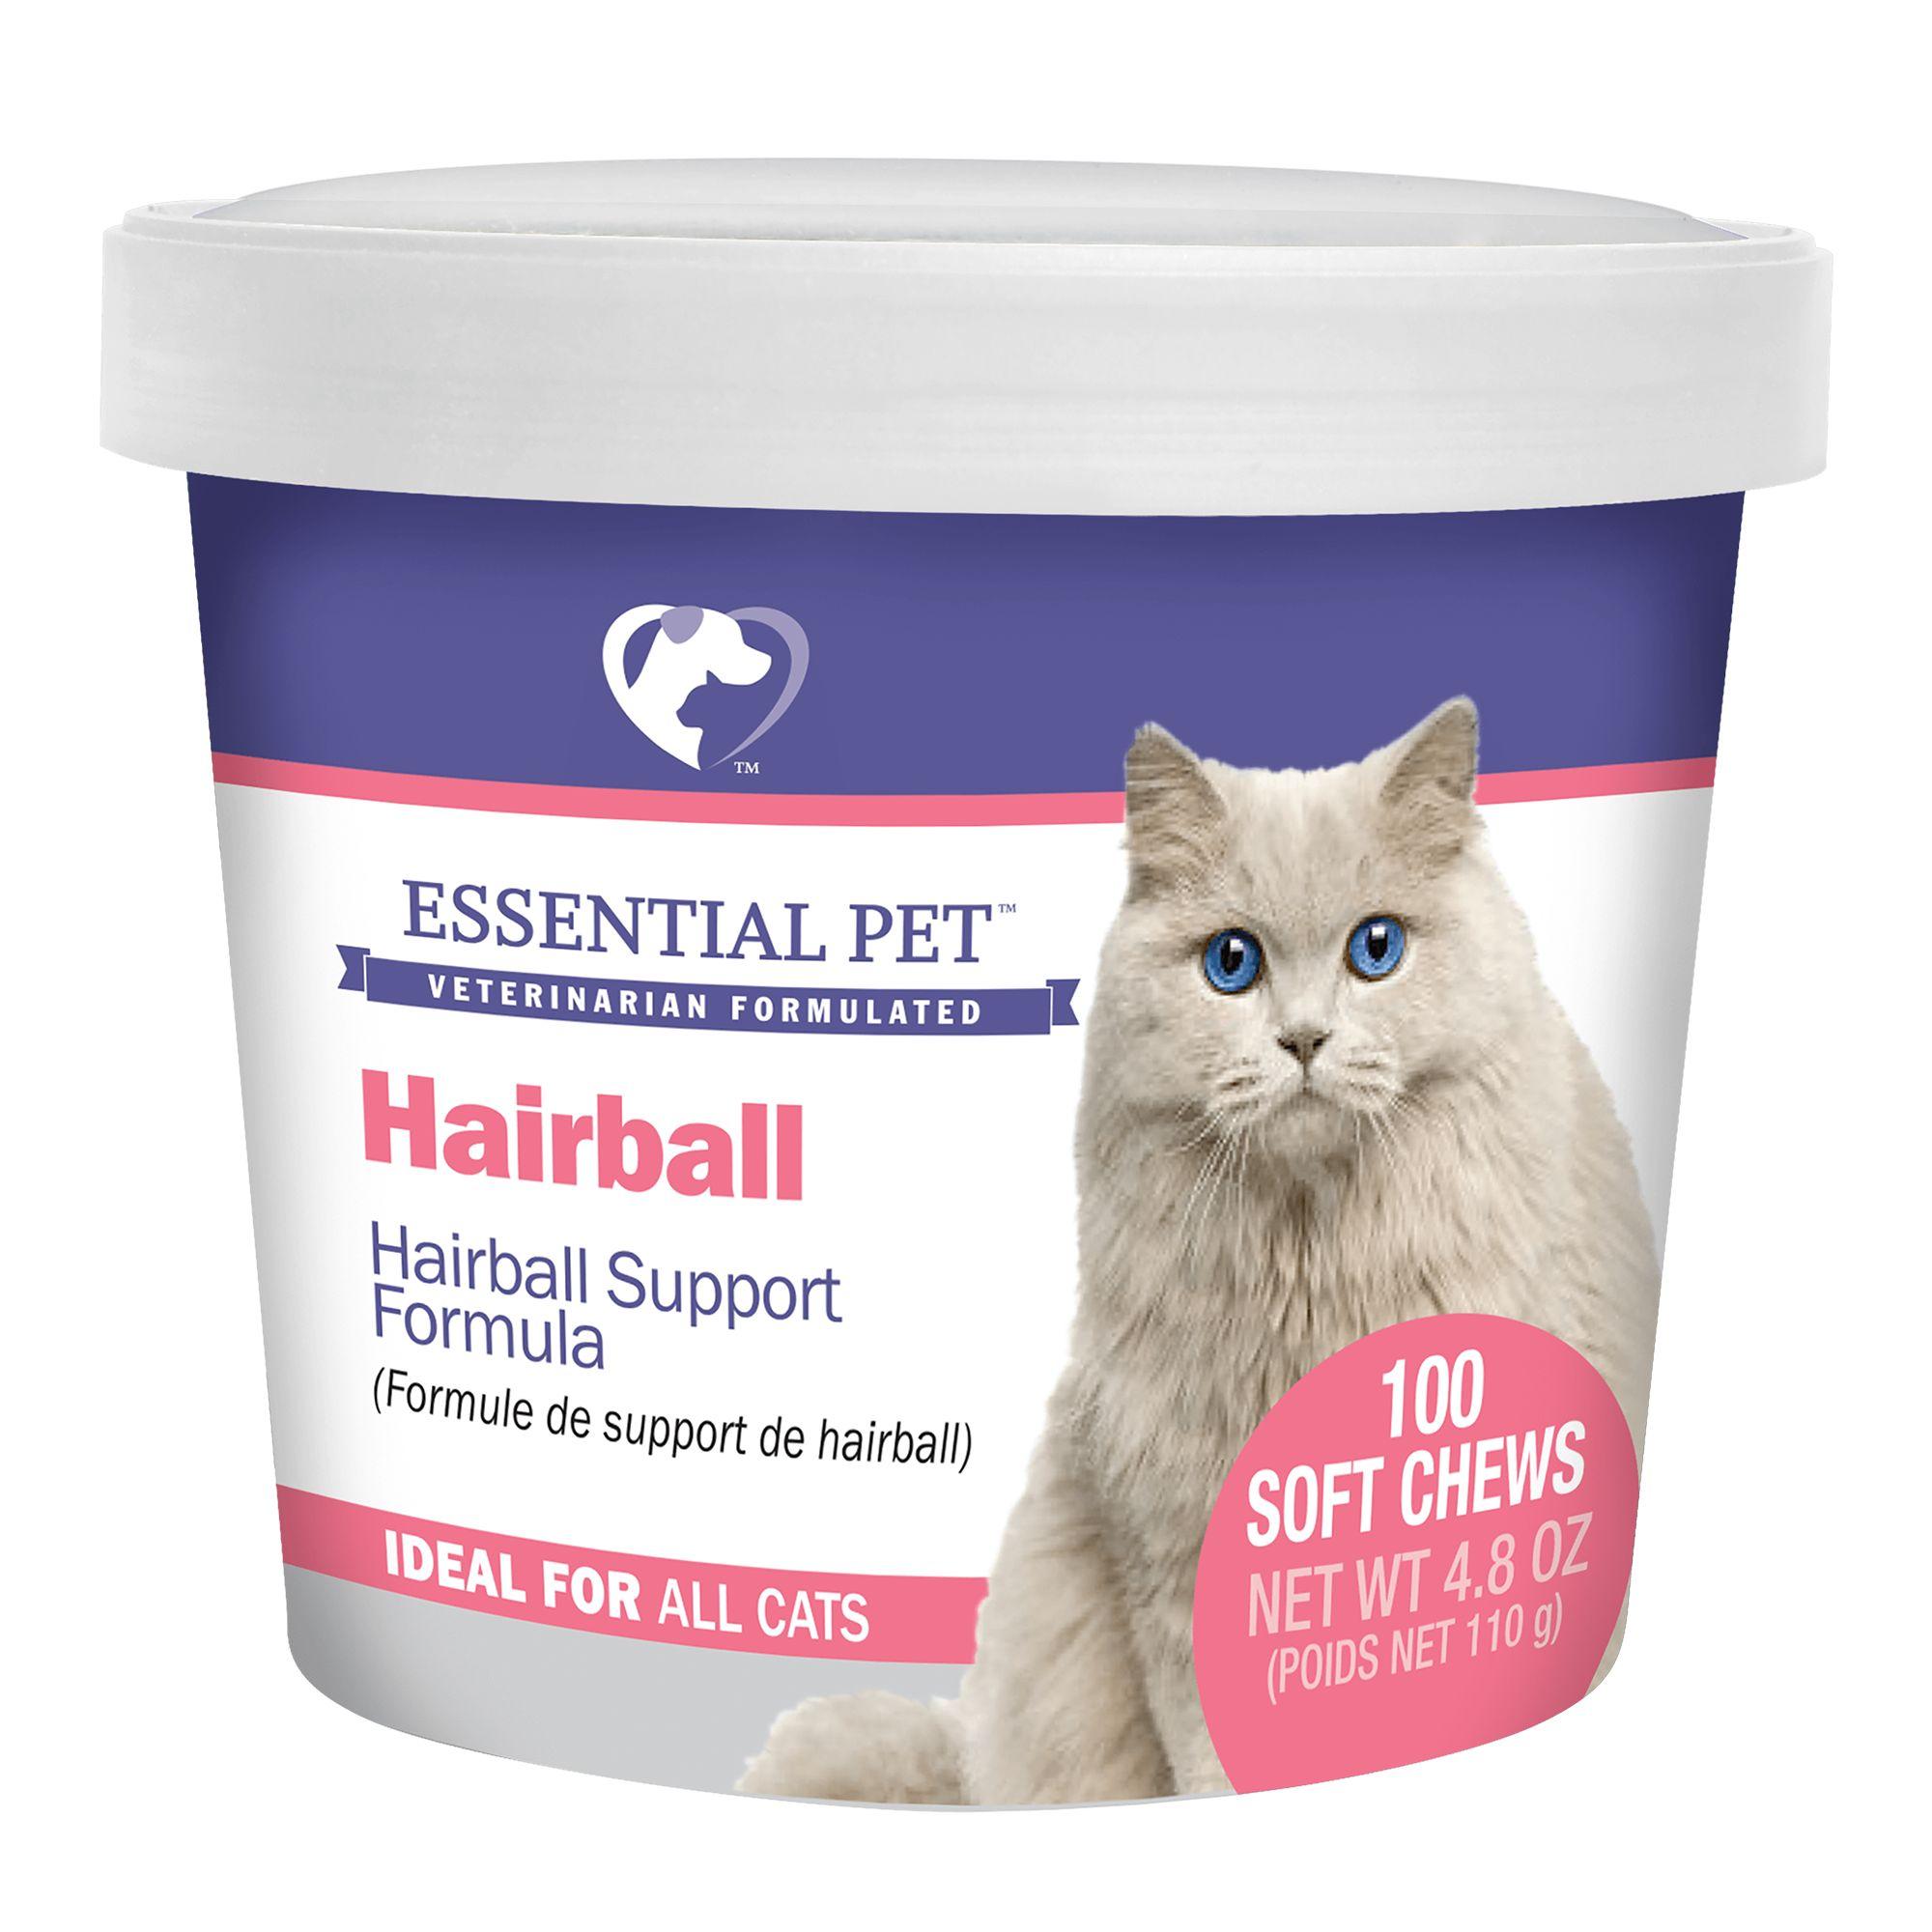 21st Century Hairball Support Cat Chews